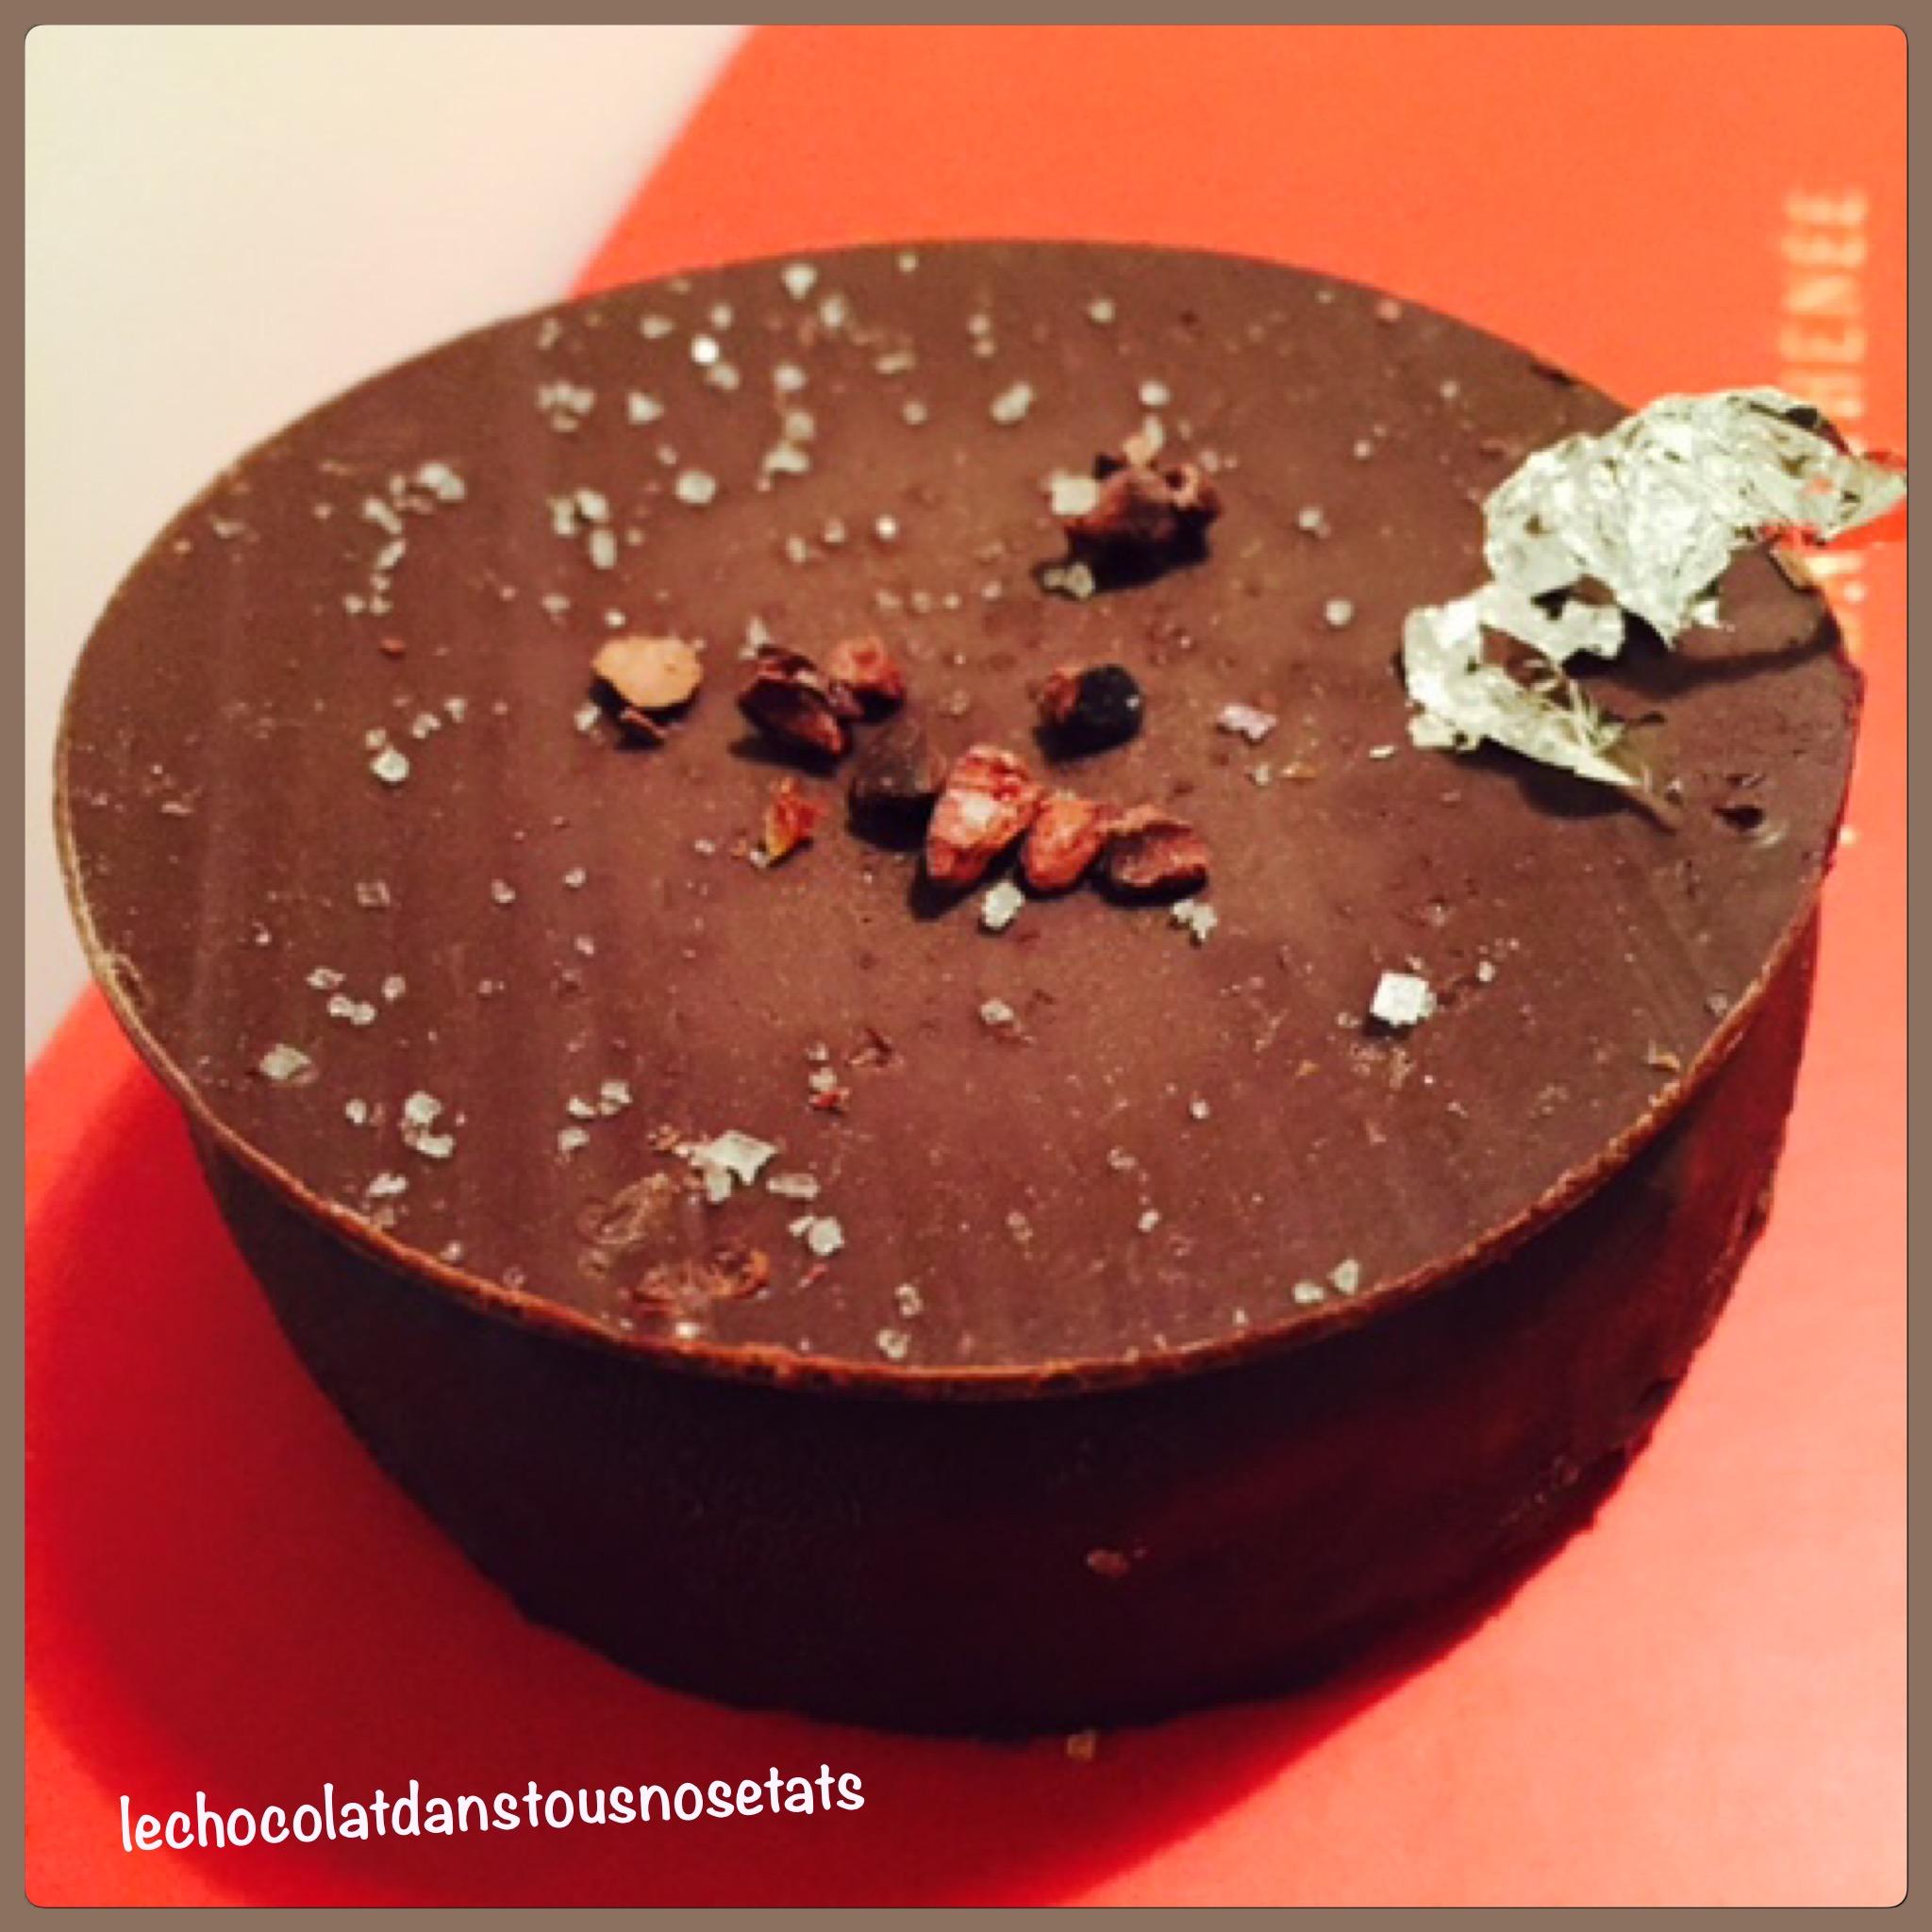 La tarte au chocolat, le Plaza Athénée, Alexandre DUFEU